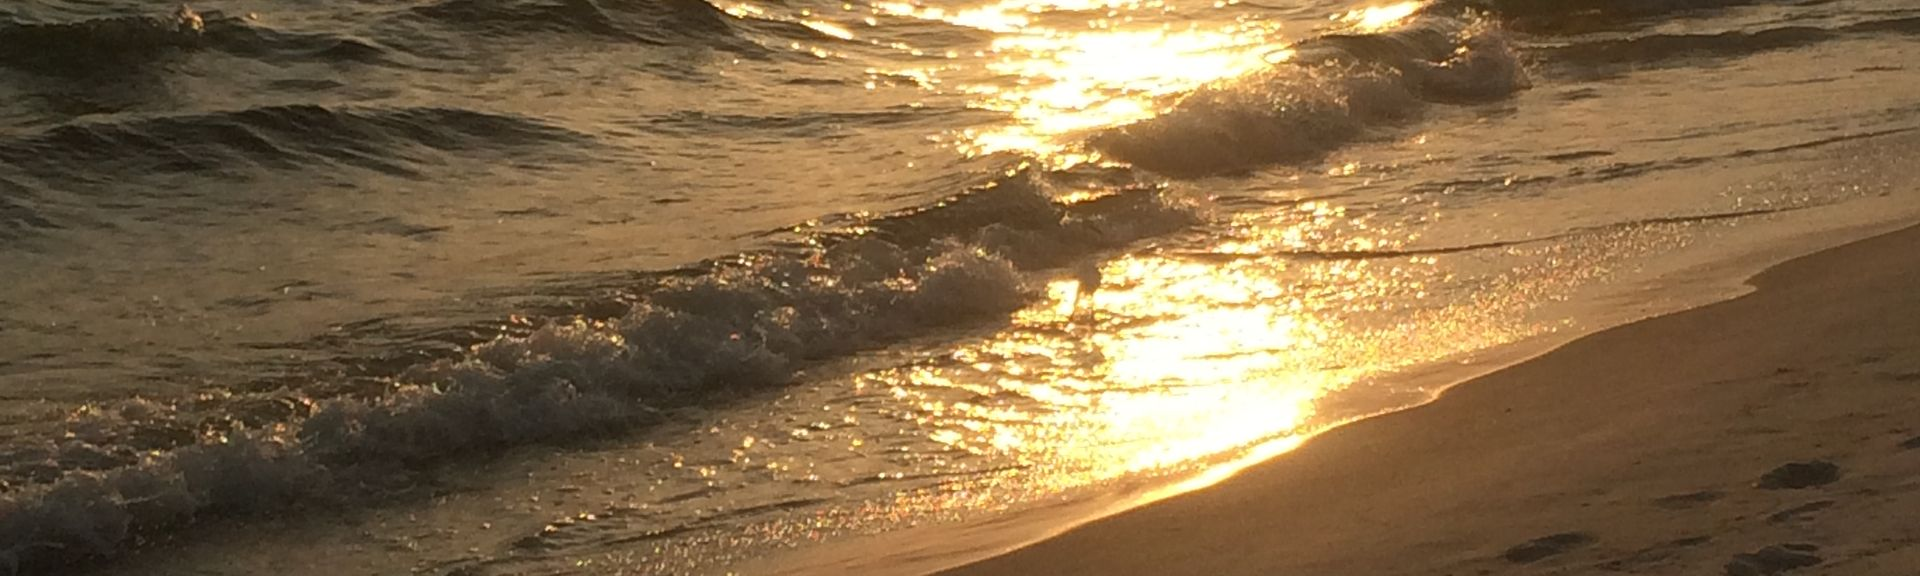 Top of the Gulf, Panama City Beach, FL, USA